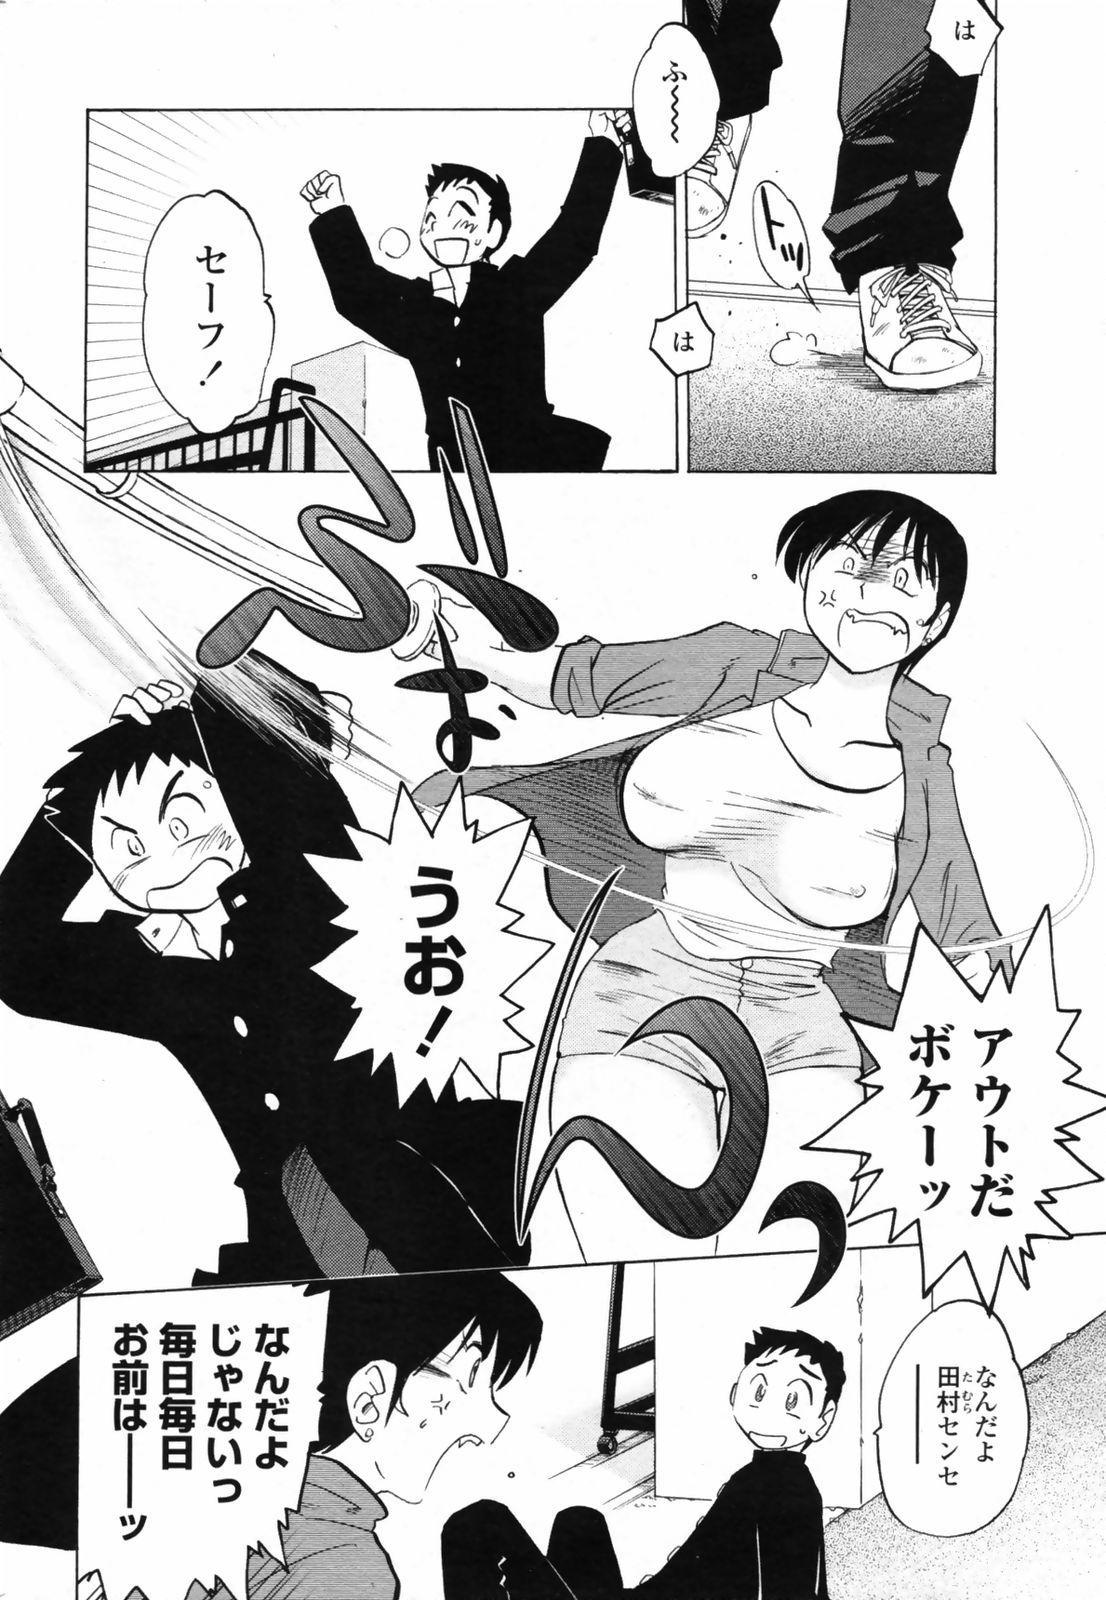 [Tsuyatsuya] Azumi-kun to Issho chapt.1-5 (Comic Penguin Club) 32